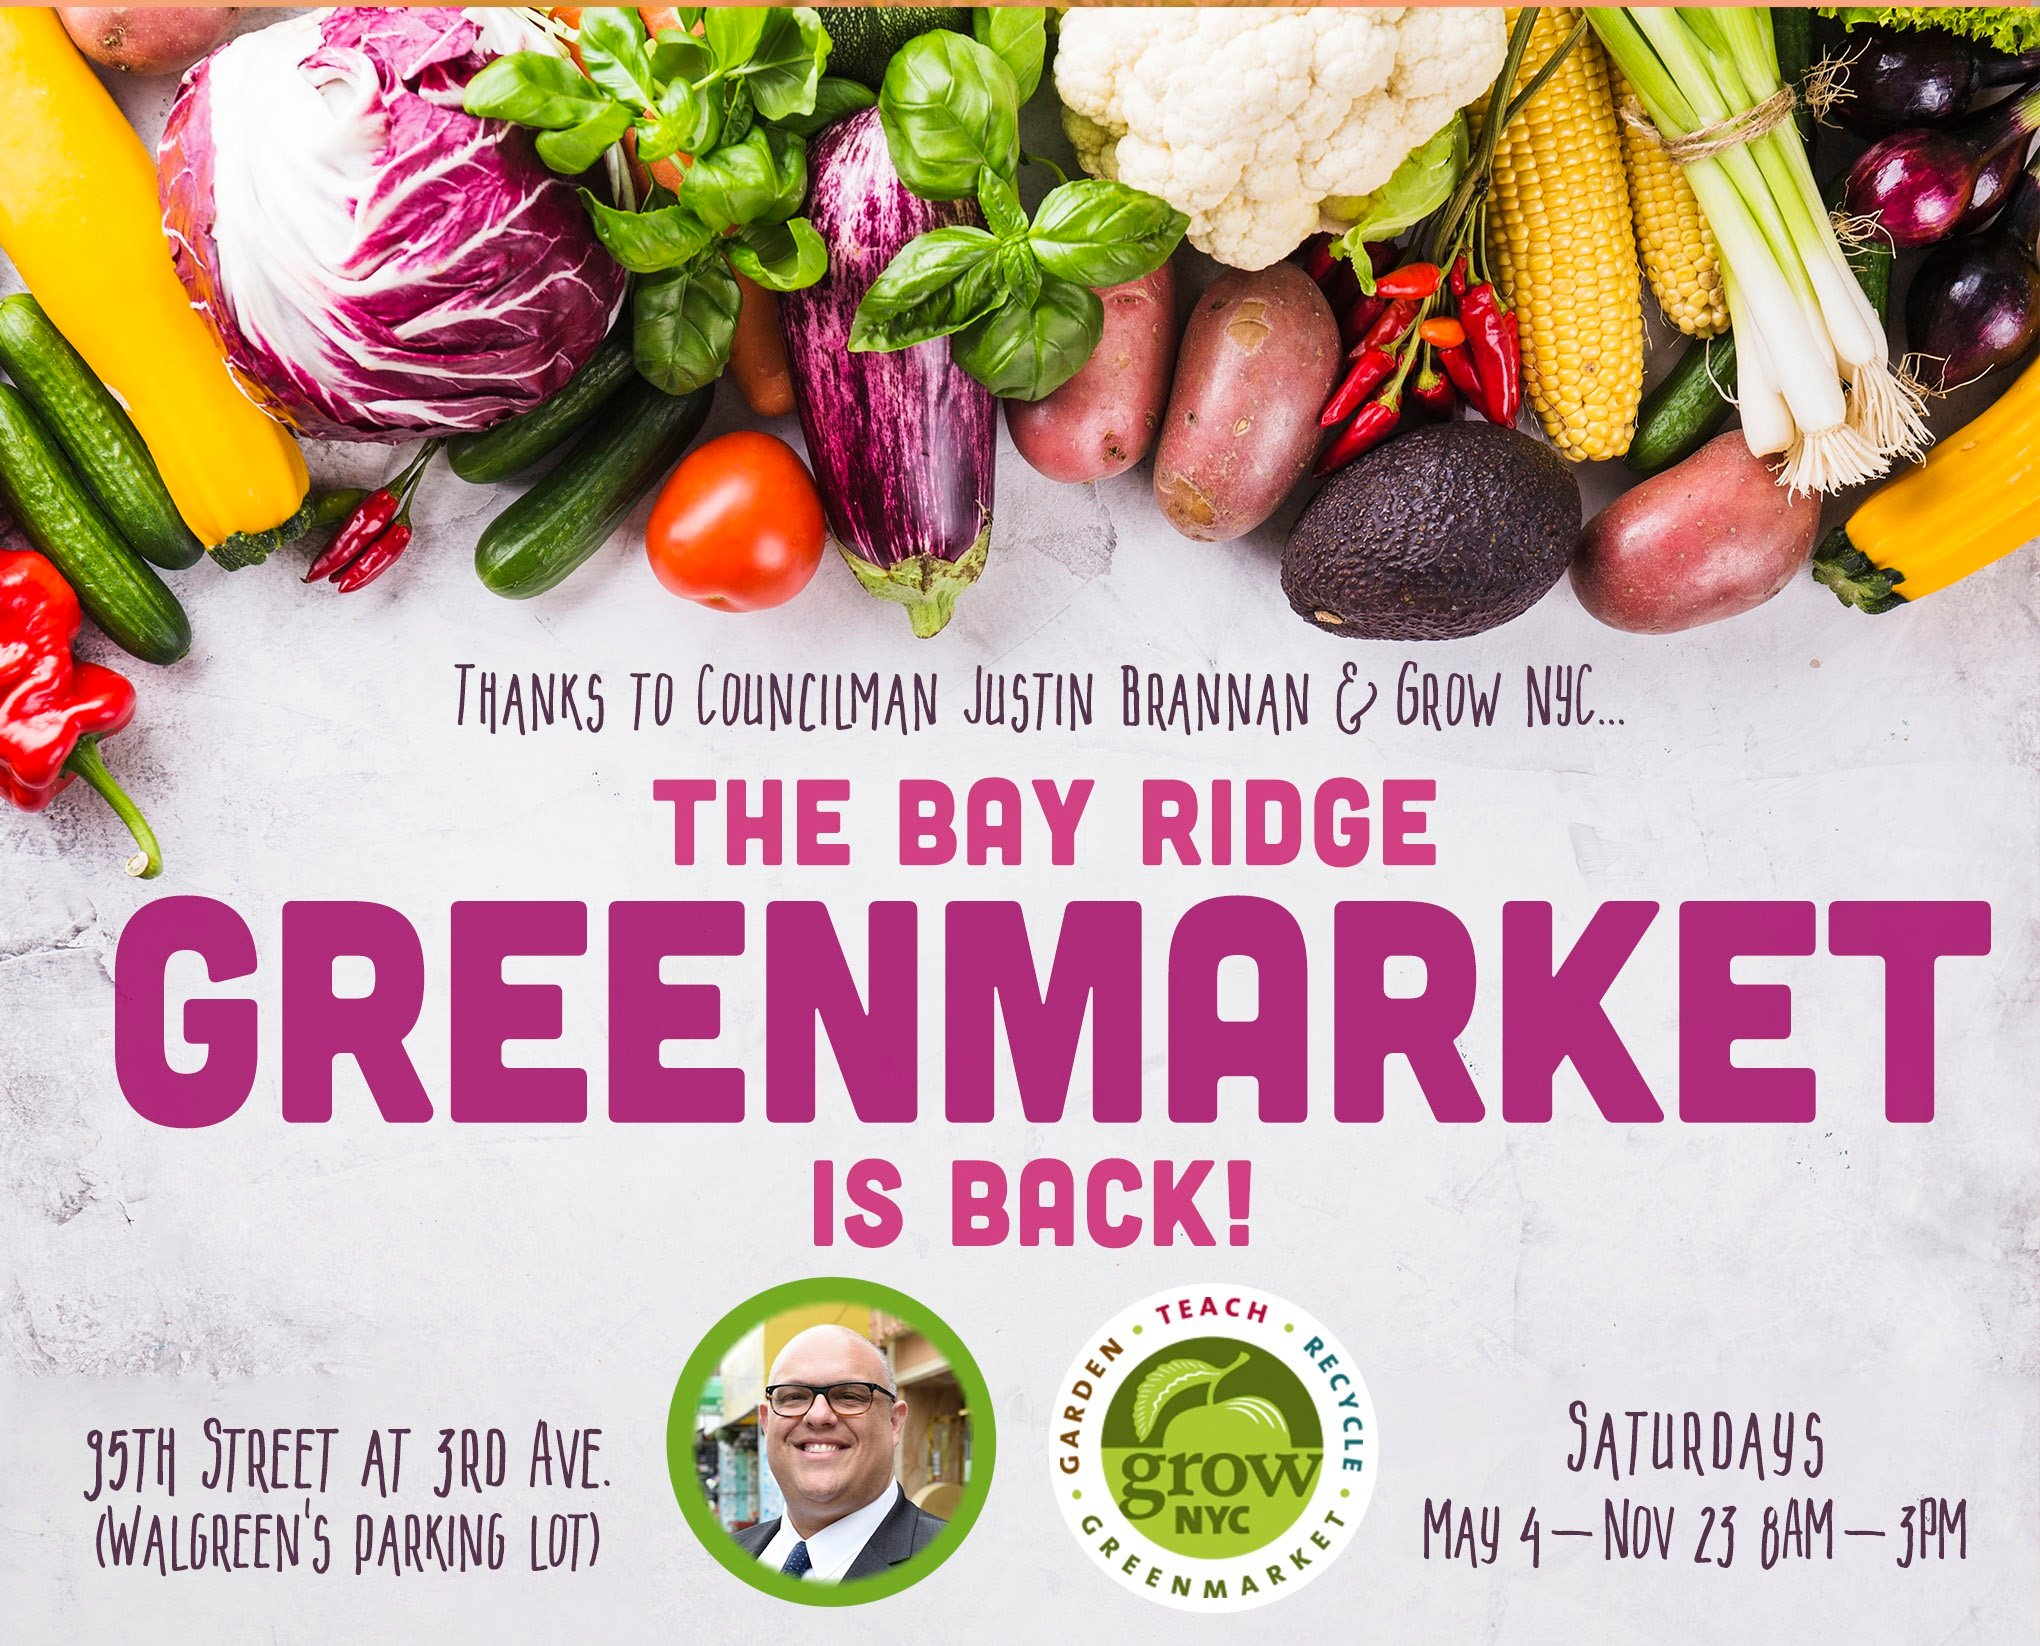 Flyer for the Bay Ridge Greenmarket